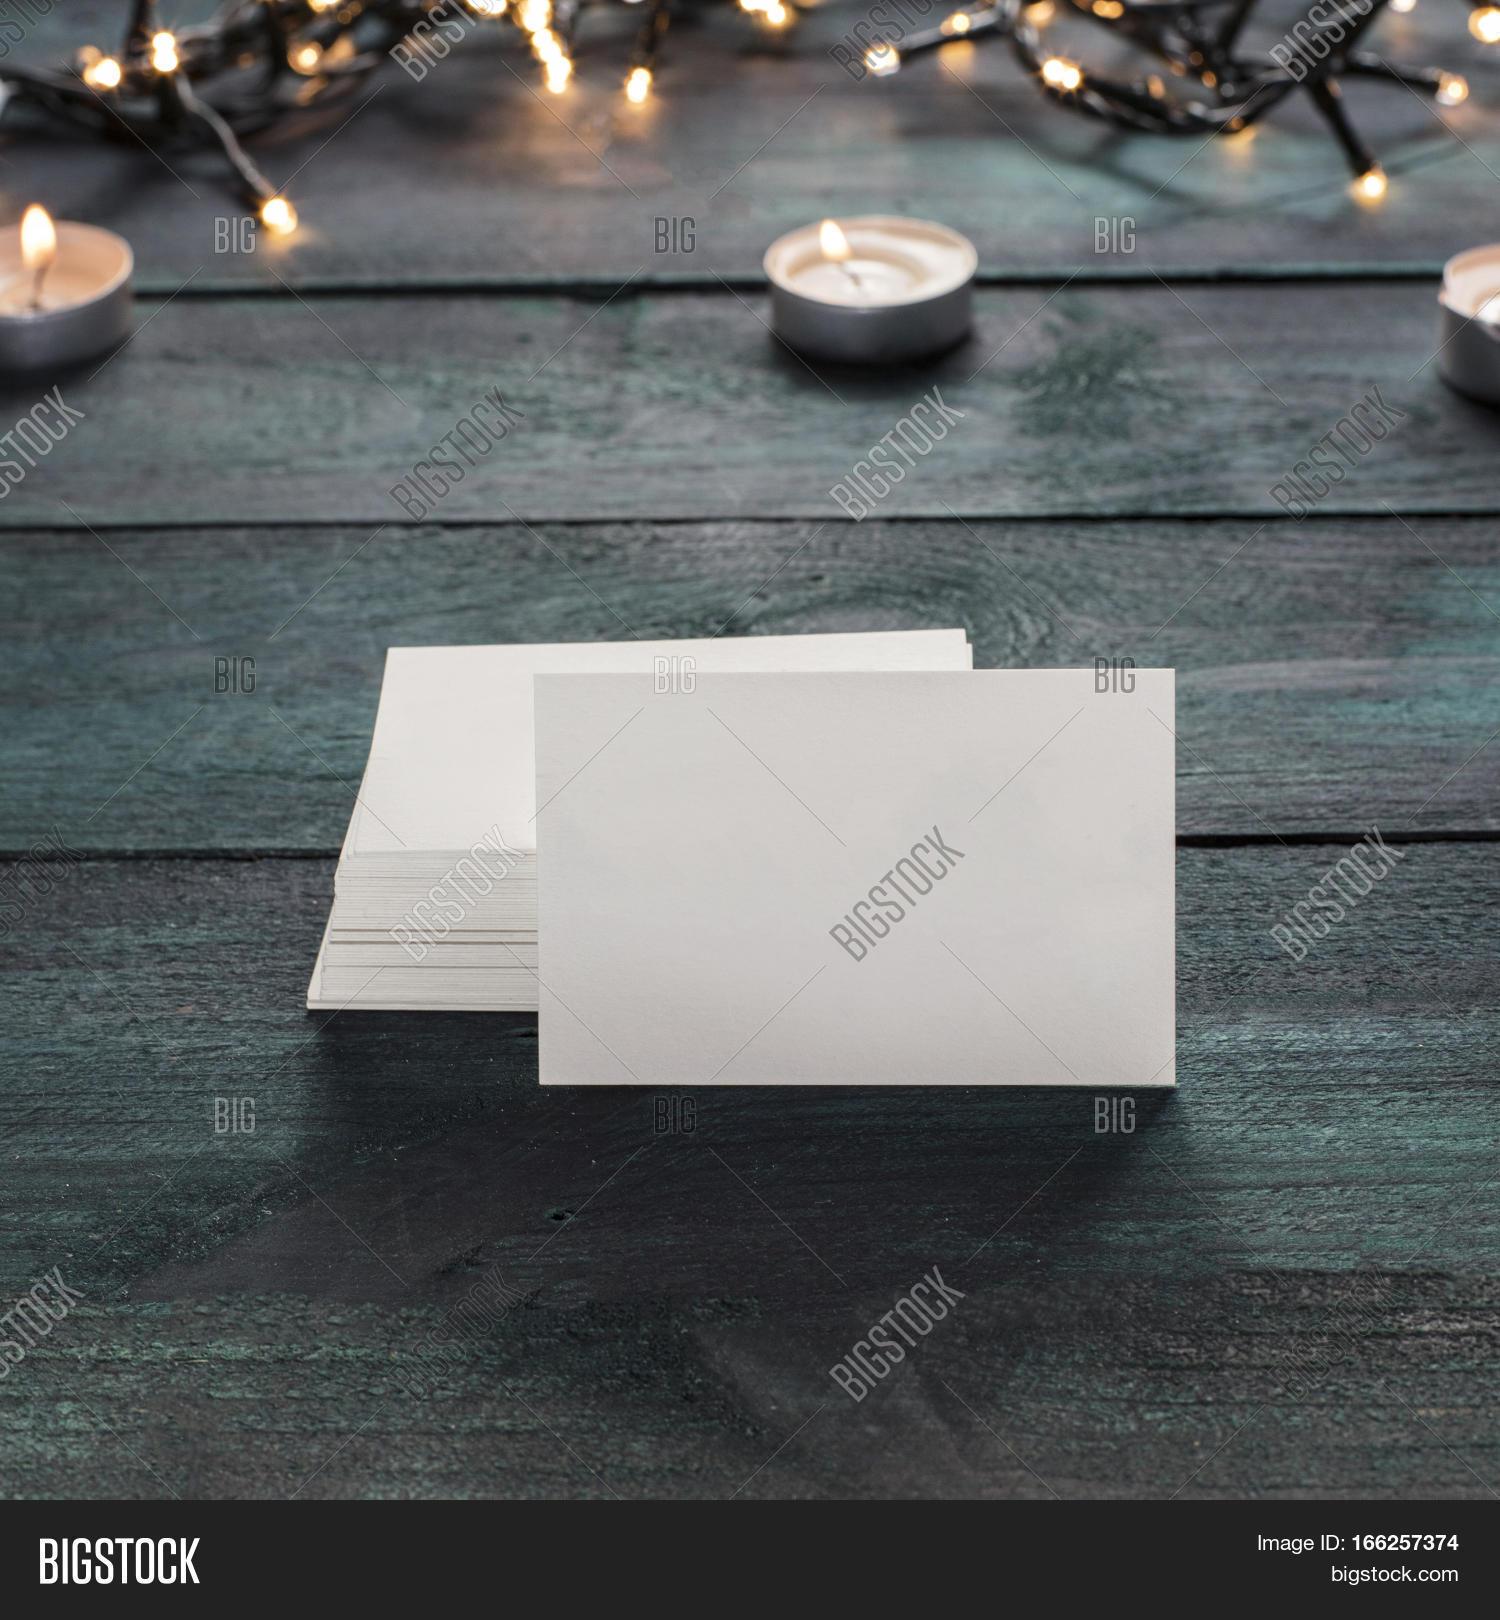 photo blank white thick cardboard image photo